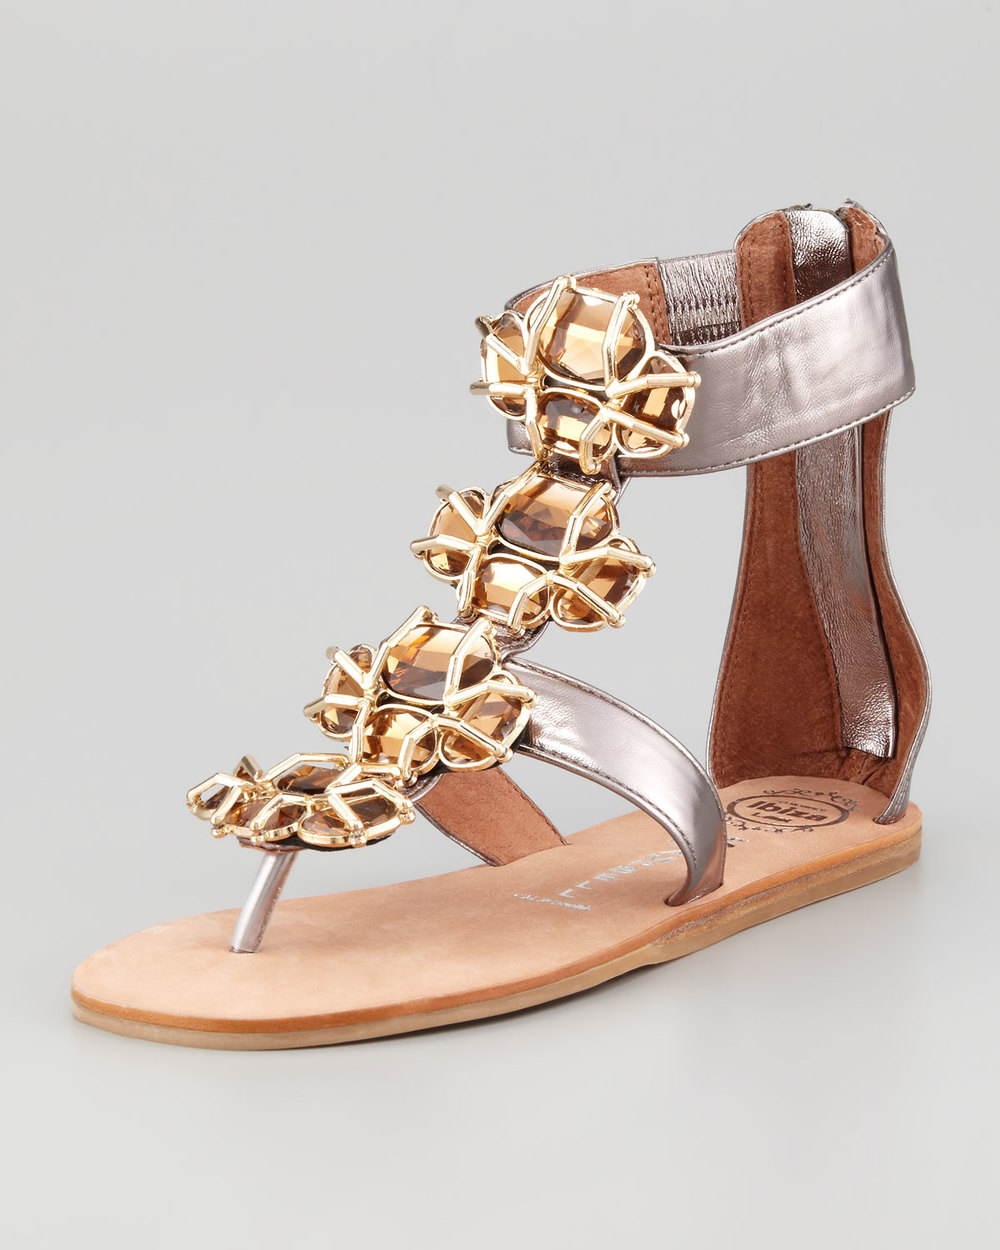 Jeffrey Campbell Tropez Jeweled Sandal